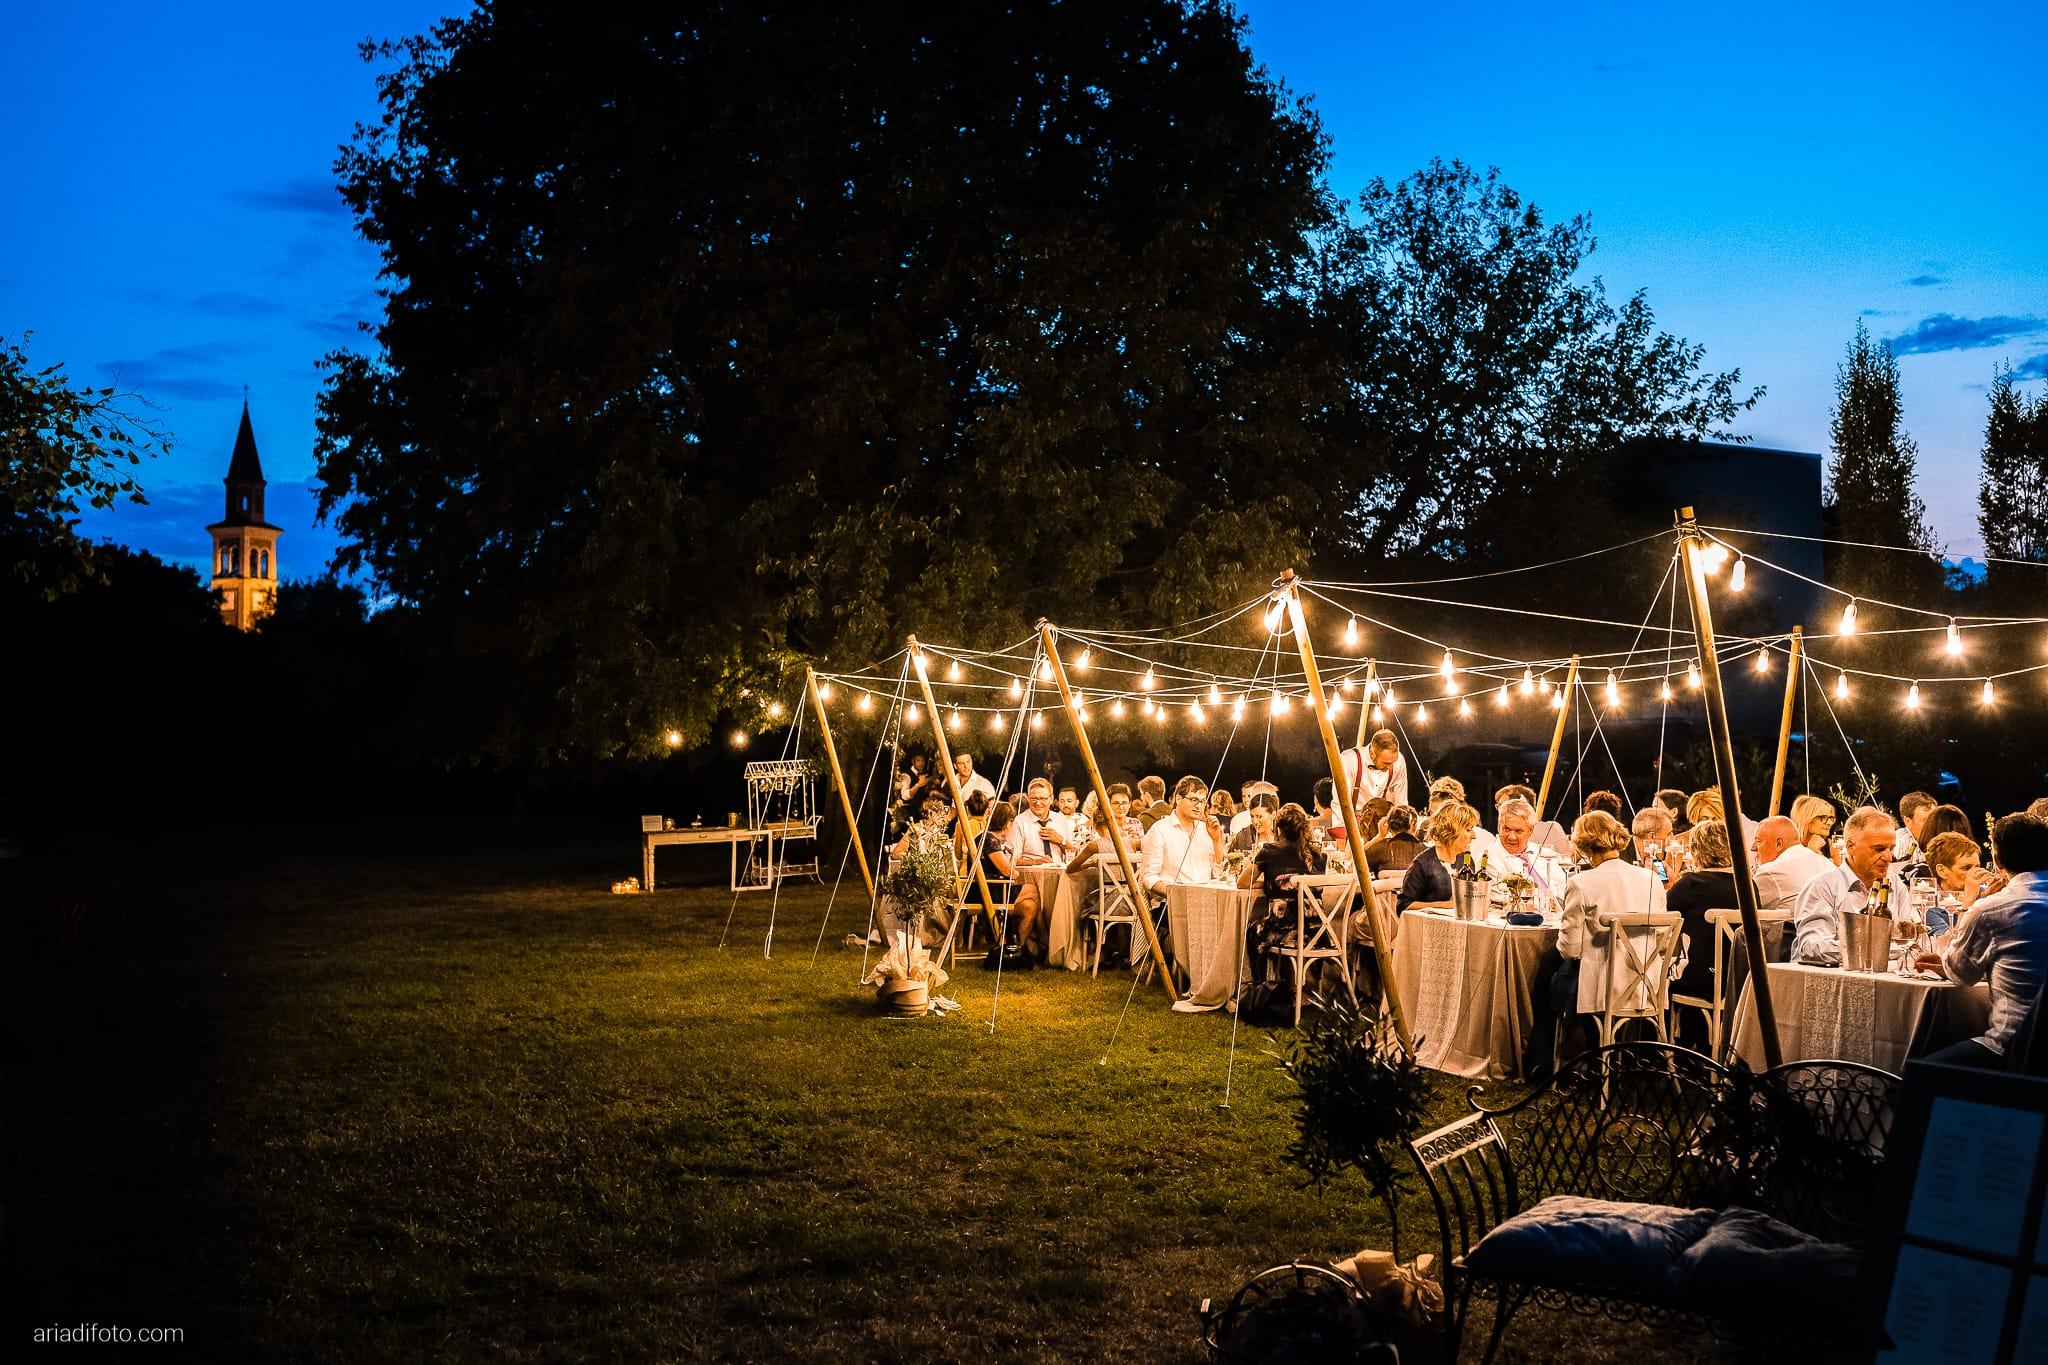 Stefania Raffaele Matrimonio Country Chic Outdoor Gorizia ricevimento cena all'aperto in giardino luci catenarie